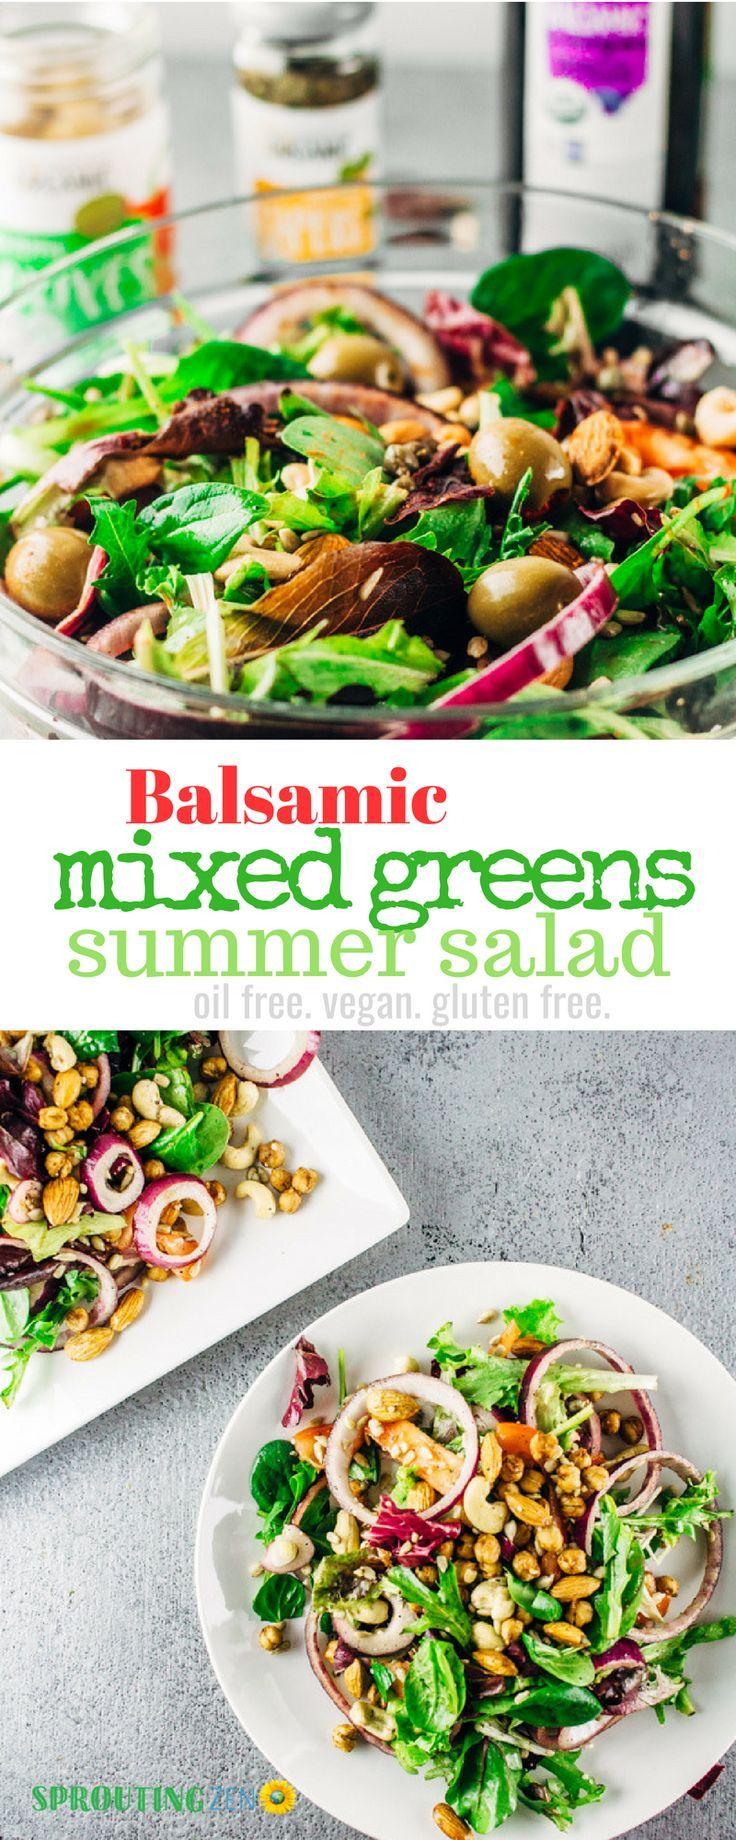 Balsamic Mixed Greens Summer Salad Oil Free